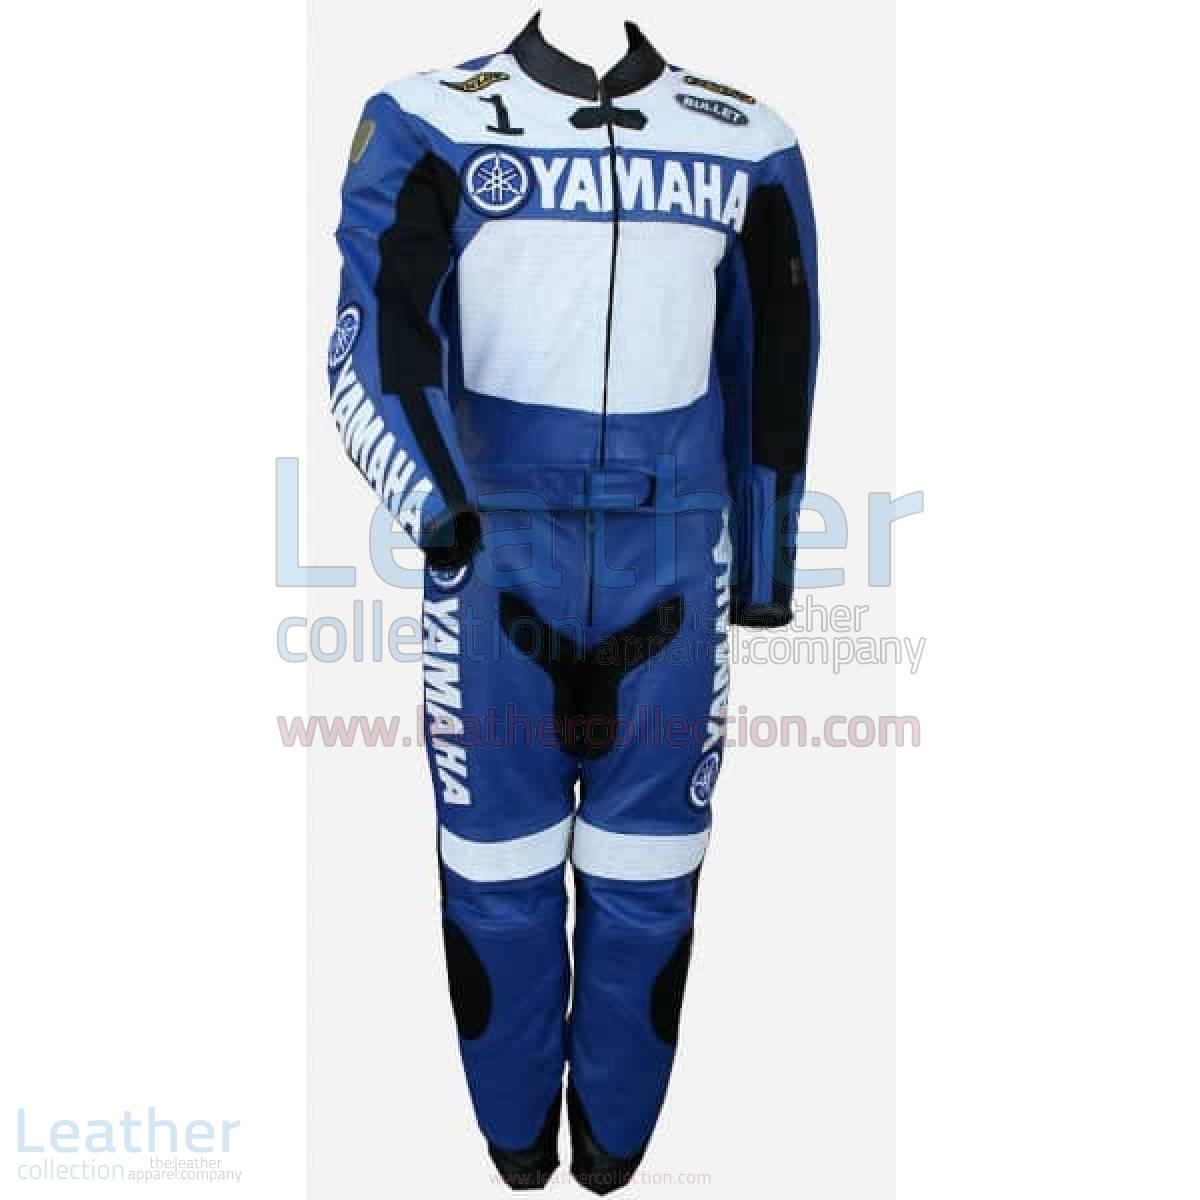 Yamaha Racing Leather Suit Blue/White